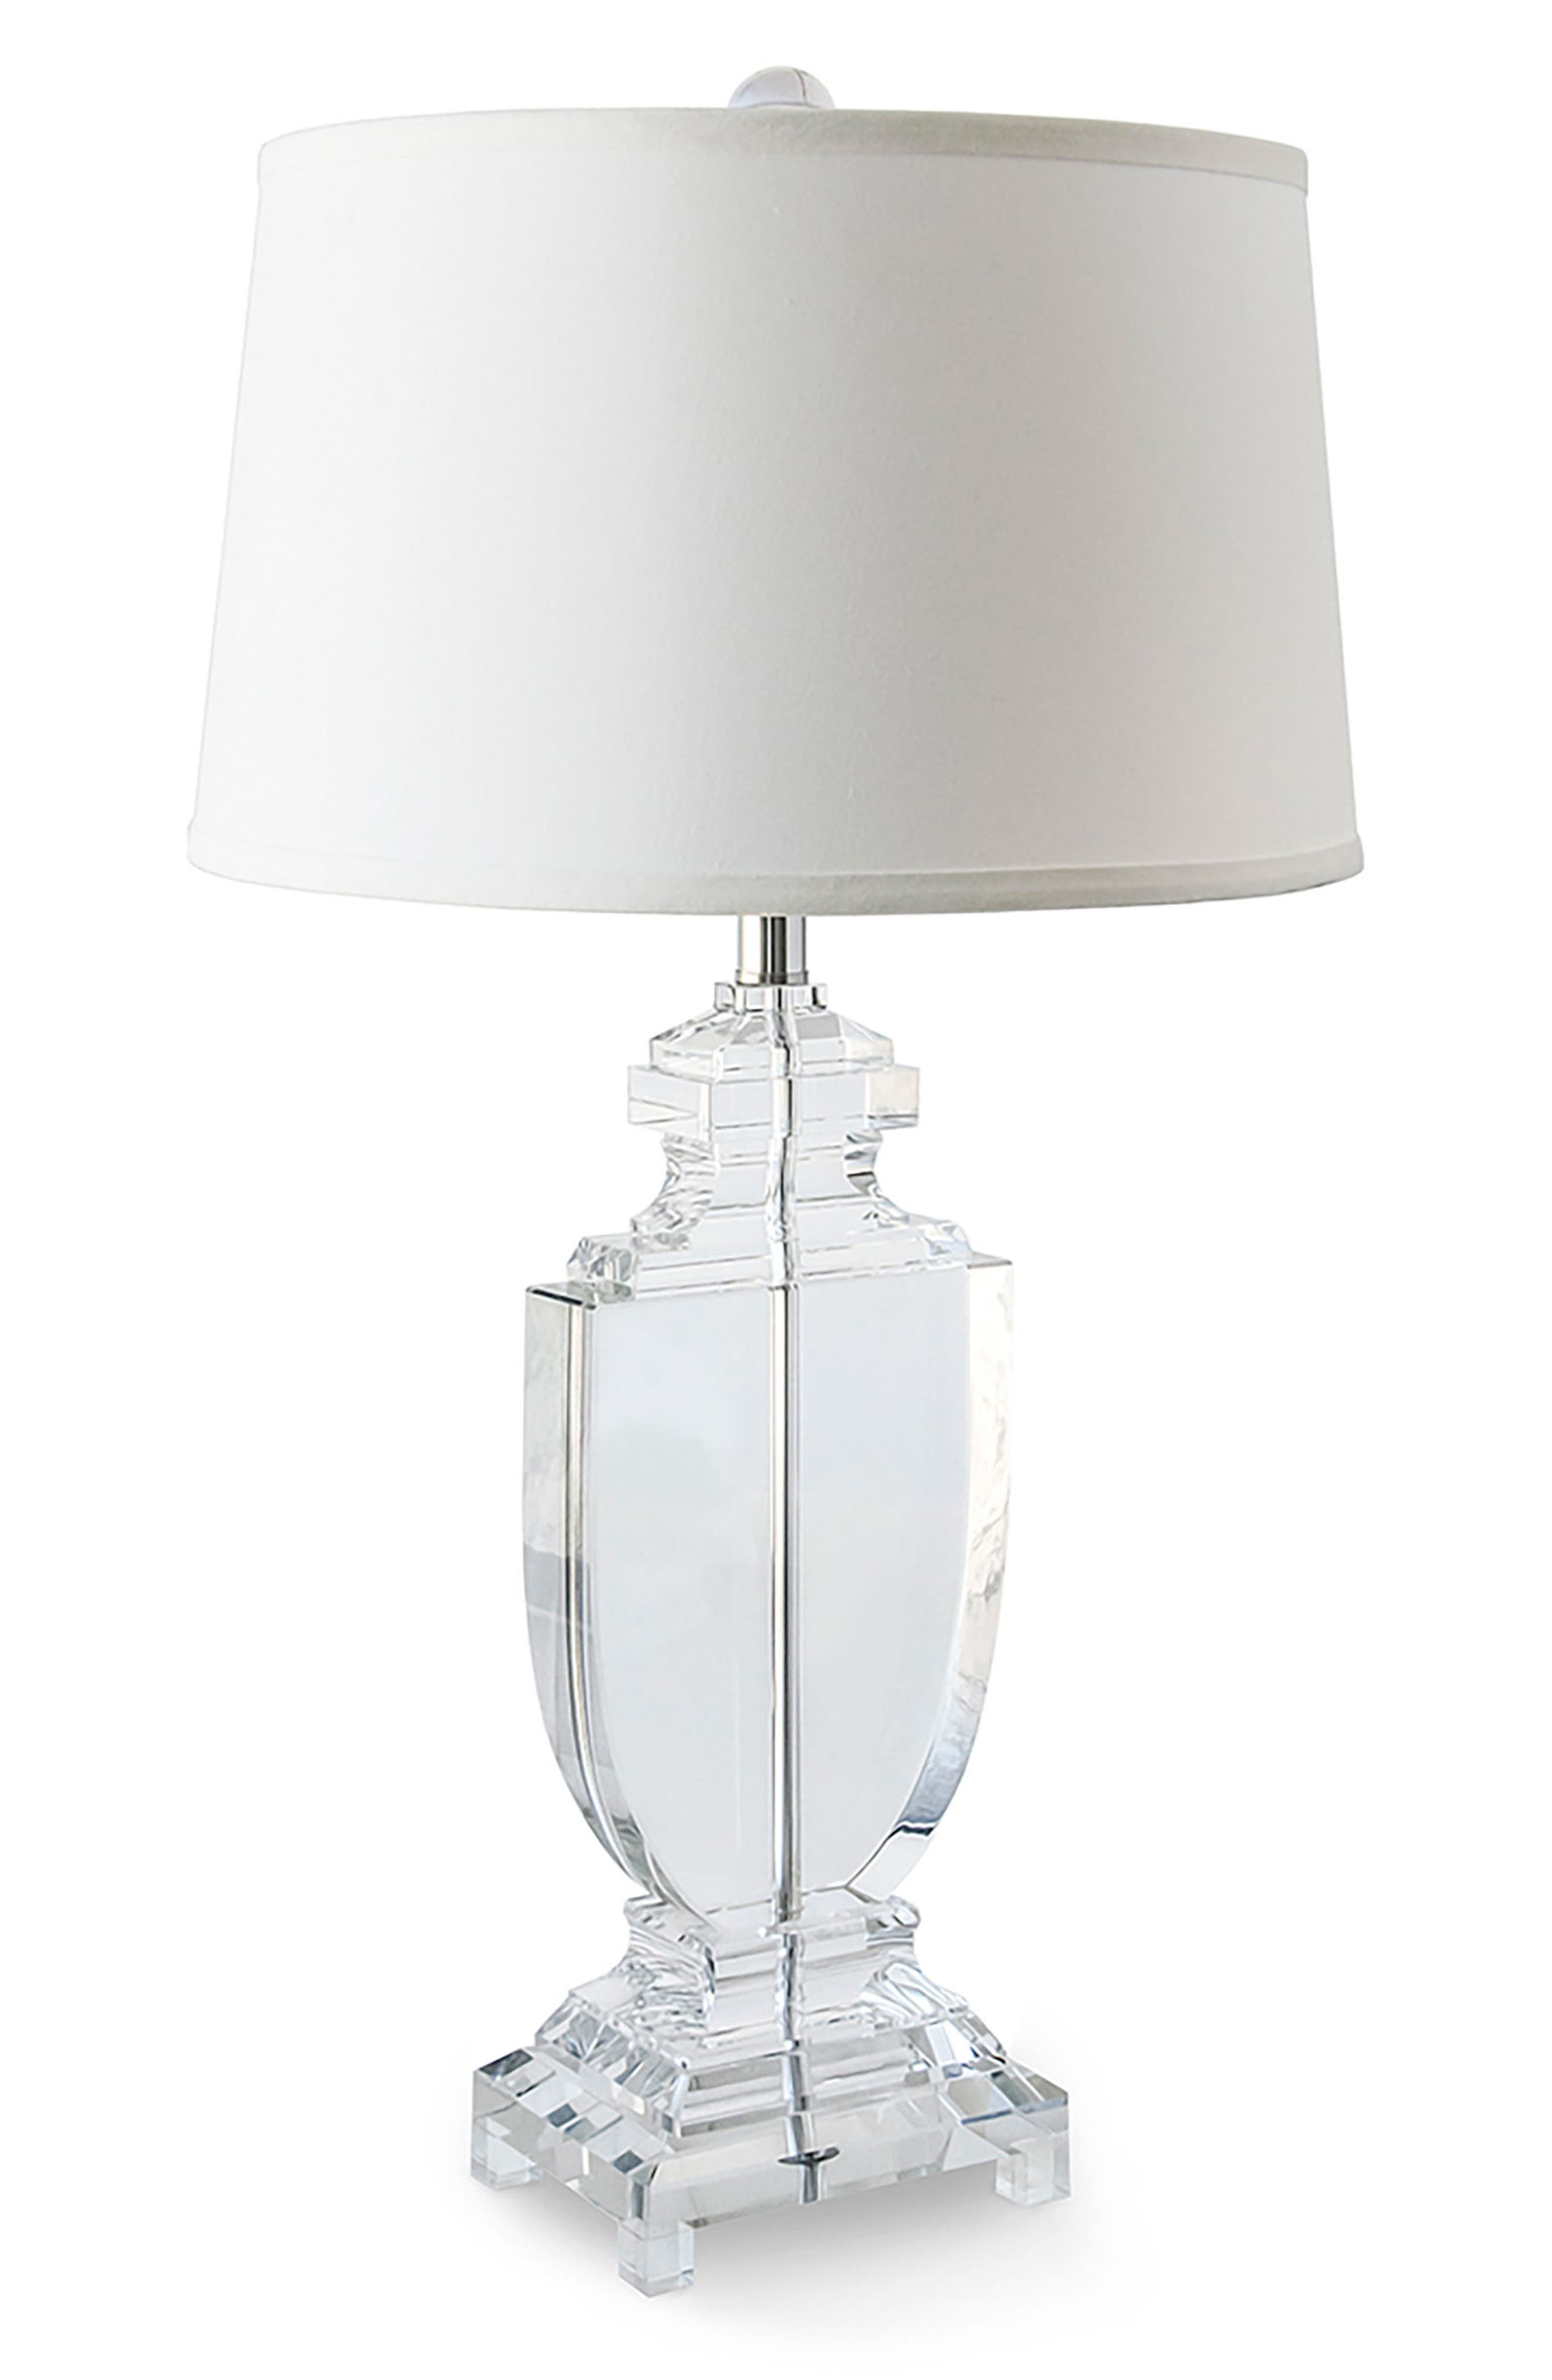 Urn Table Lamp,                             Main thumbnail 1, color,                             White